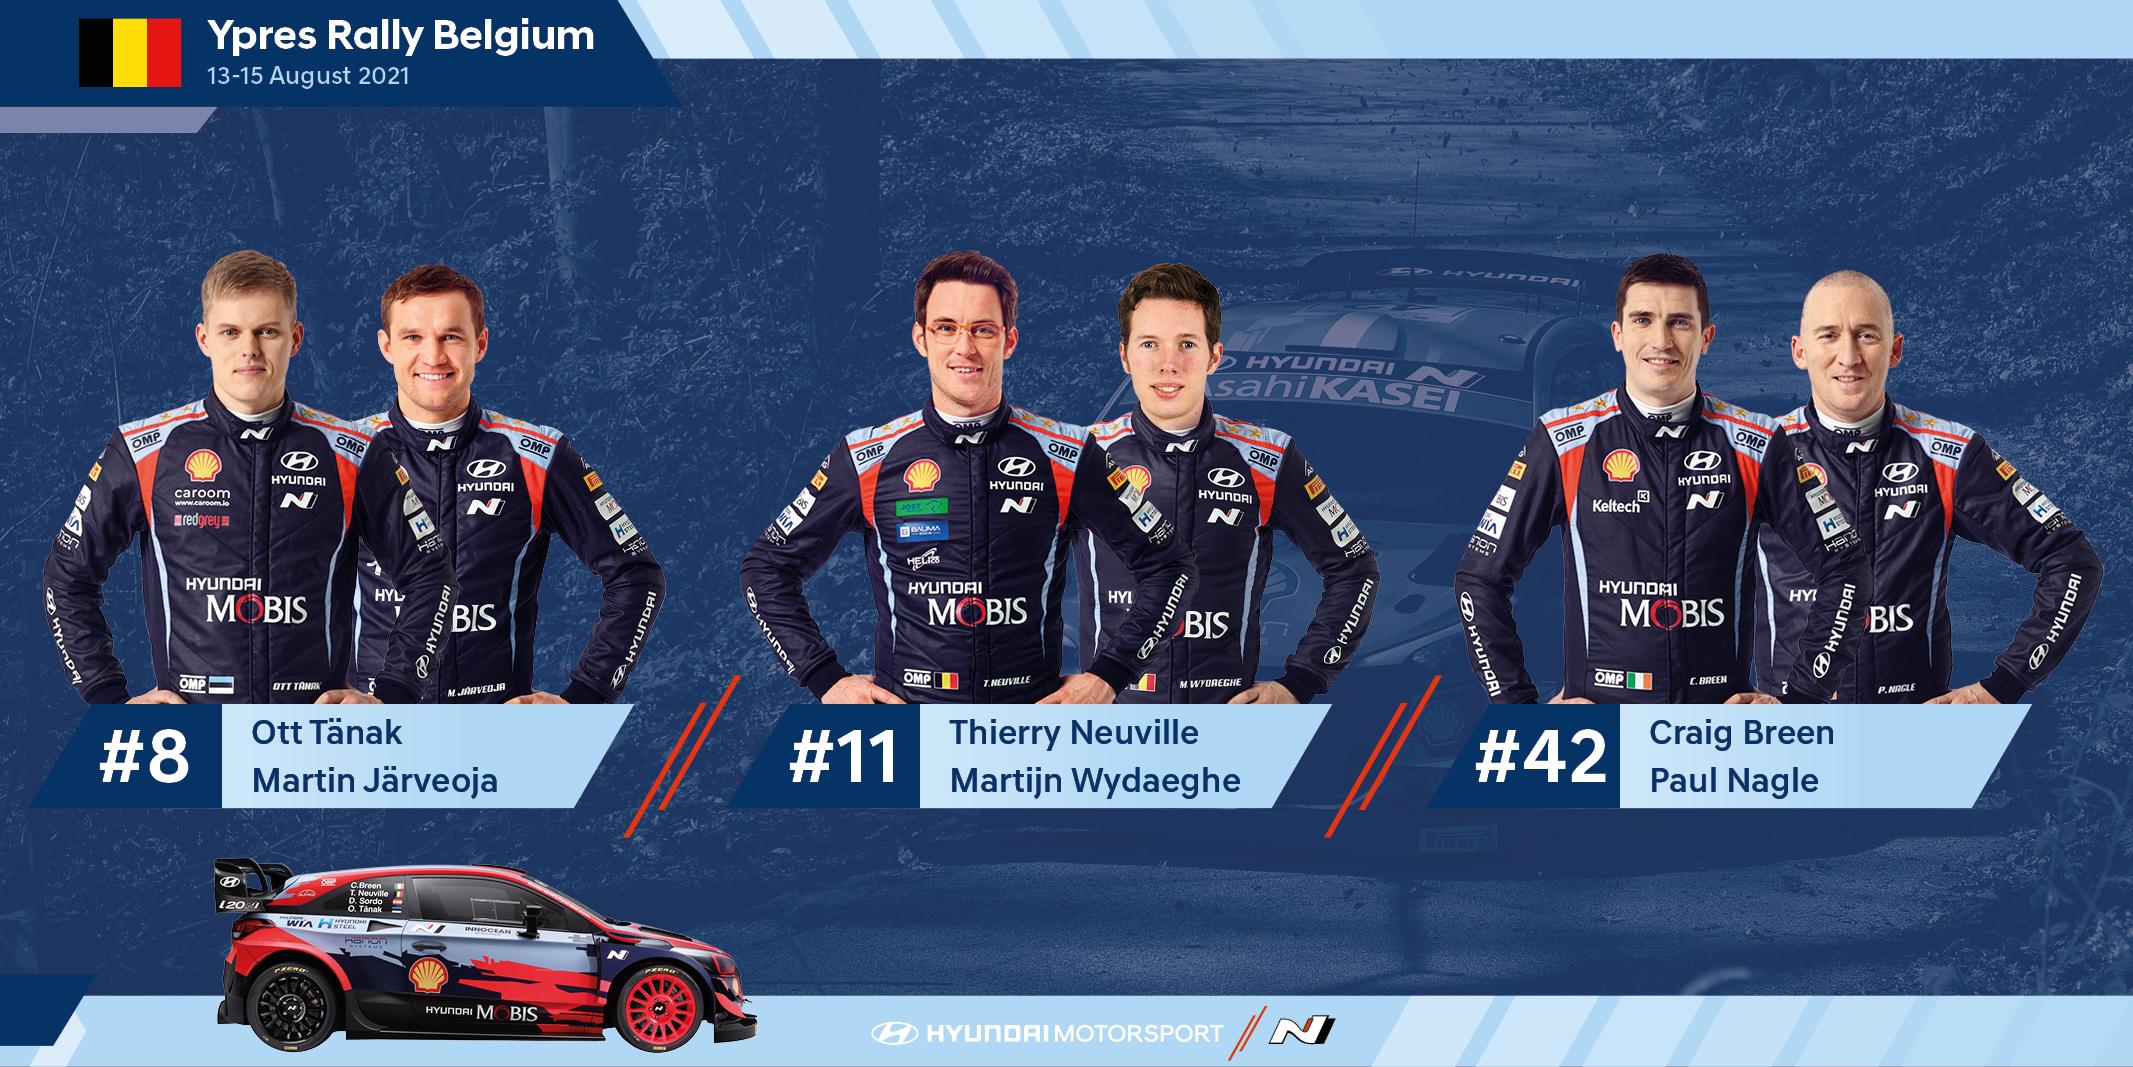 World Rally Championship: Temporada 2021  - Página 31 E5wcXQRXEAEHbLs?format=jpg&name=4096x4096